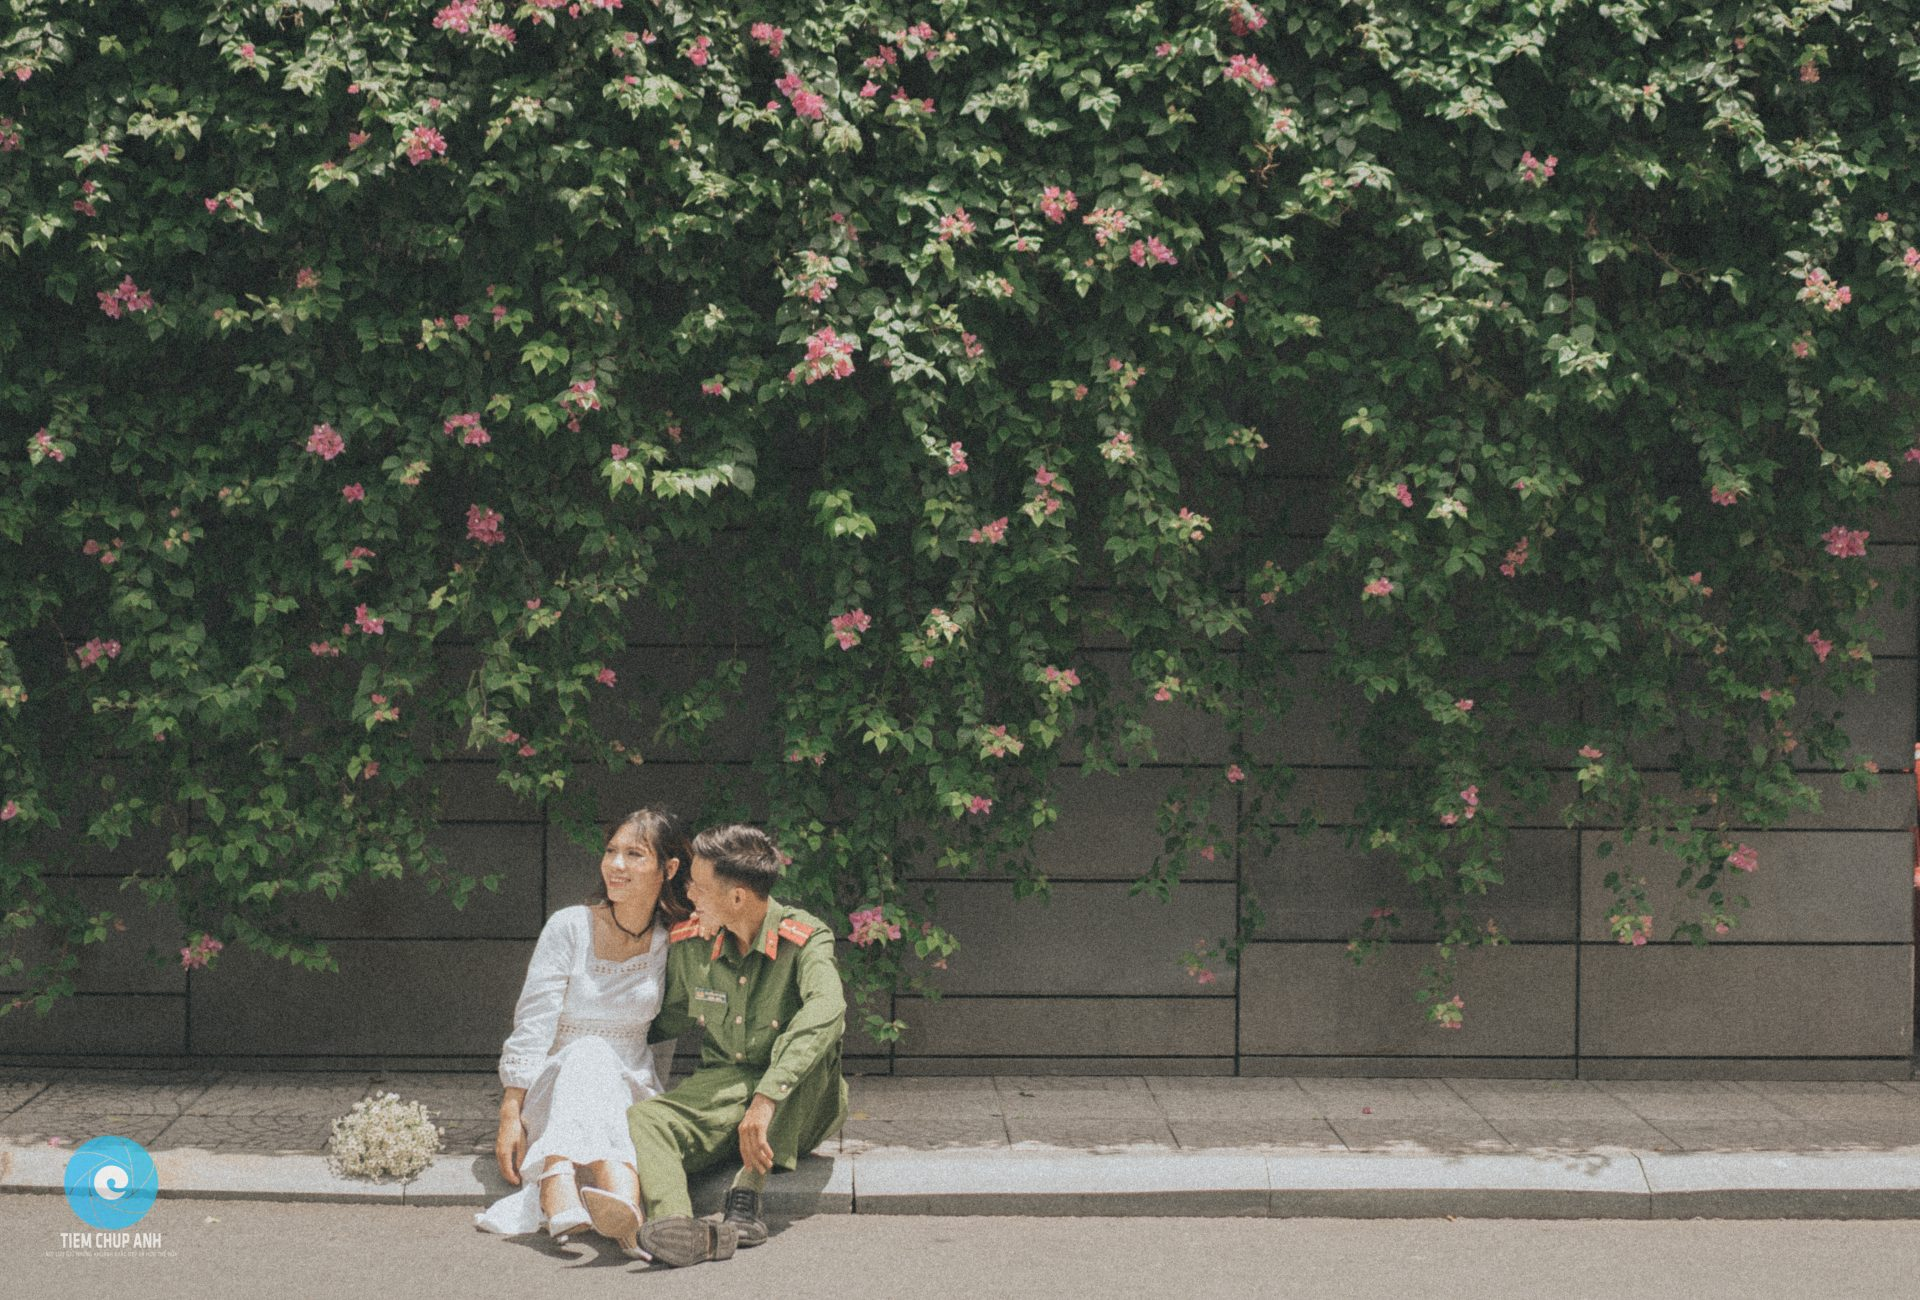 gói chụp ảnh couple tphcm